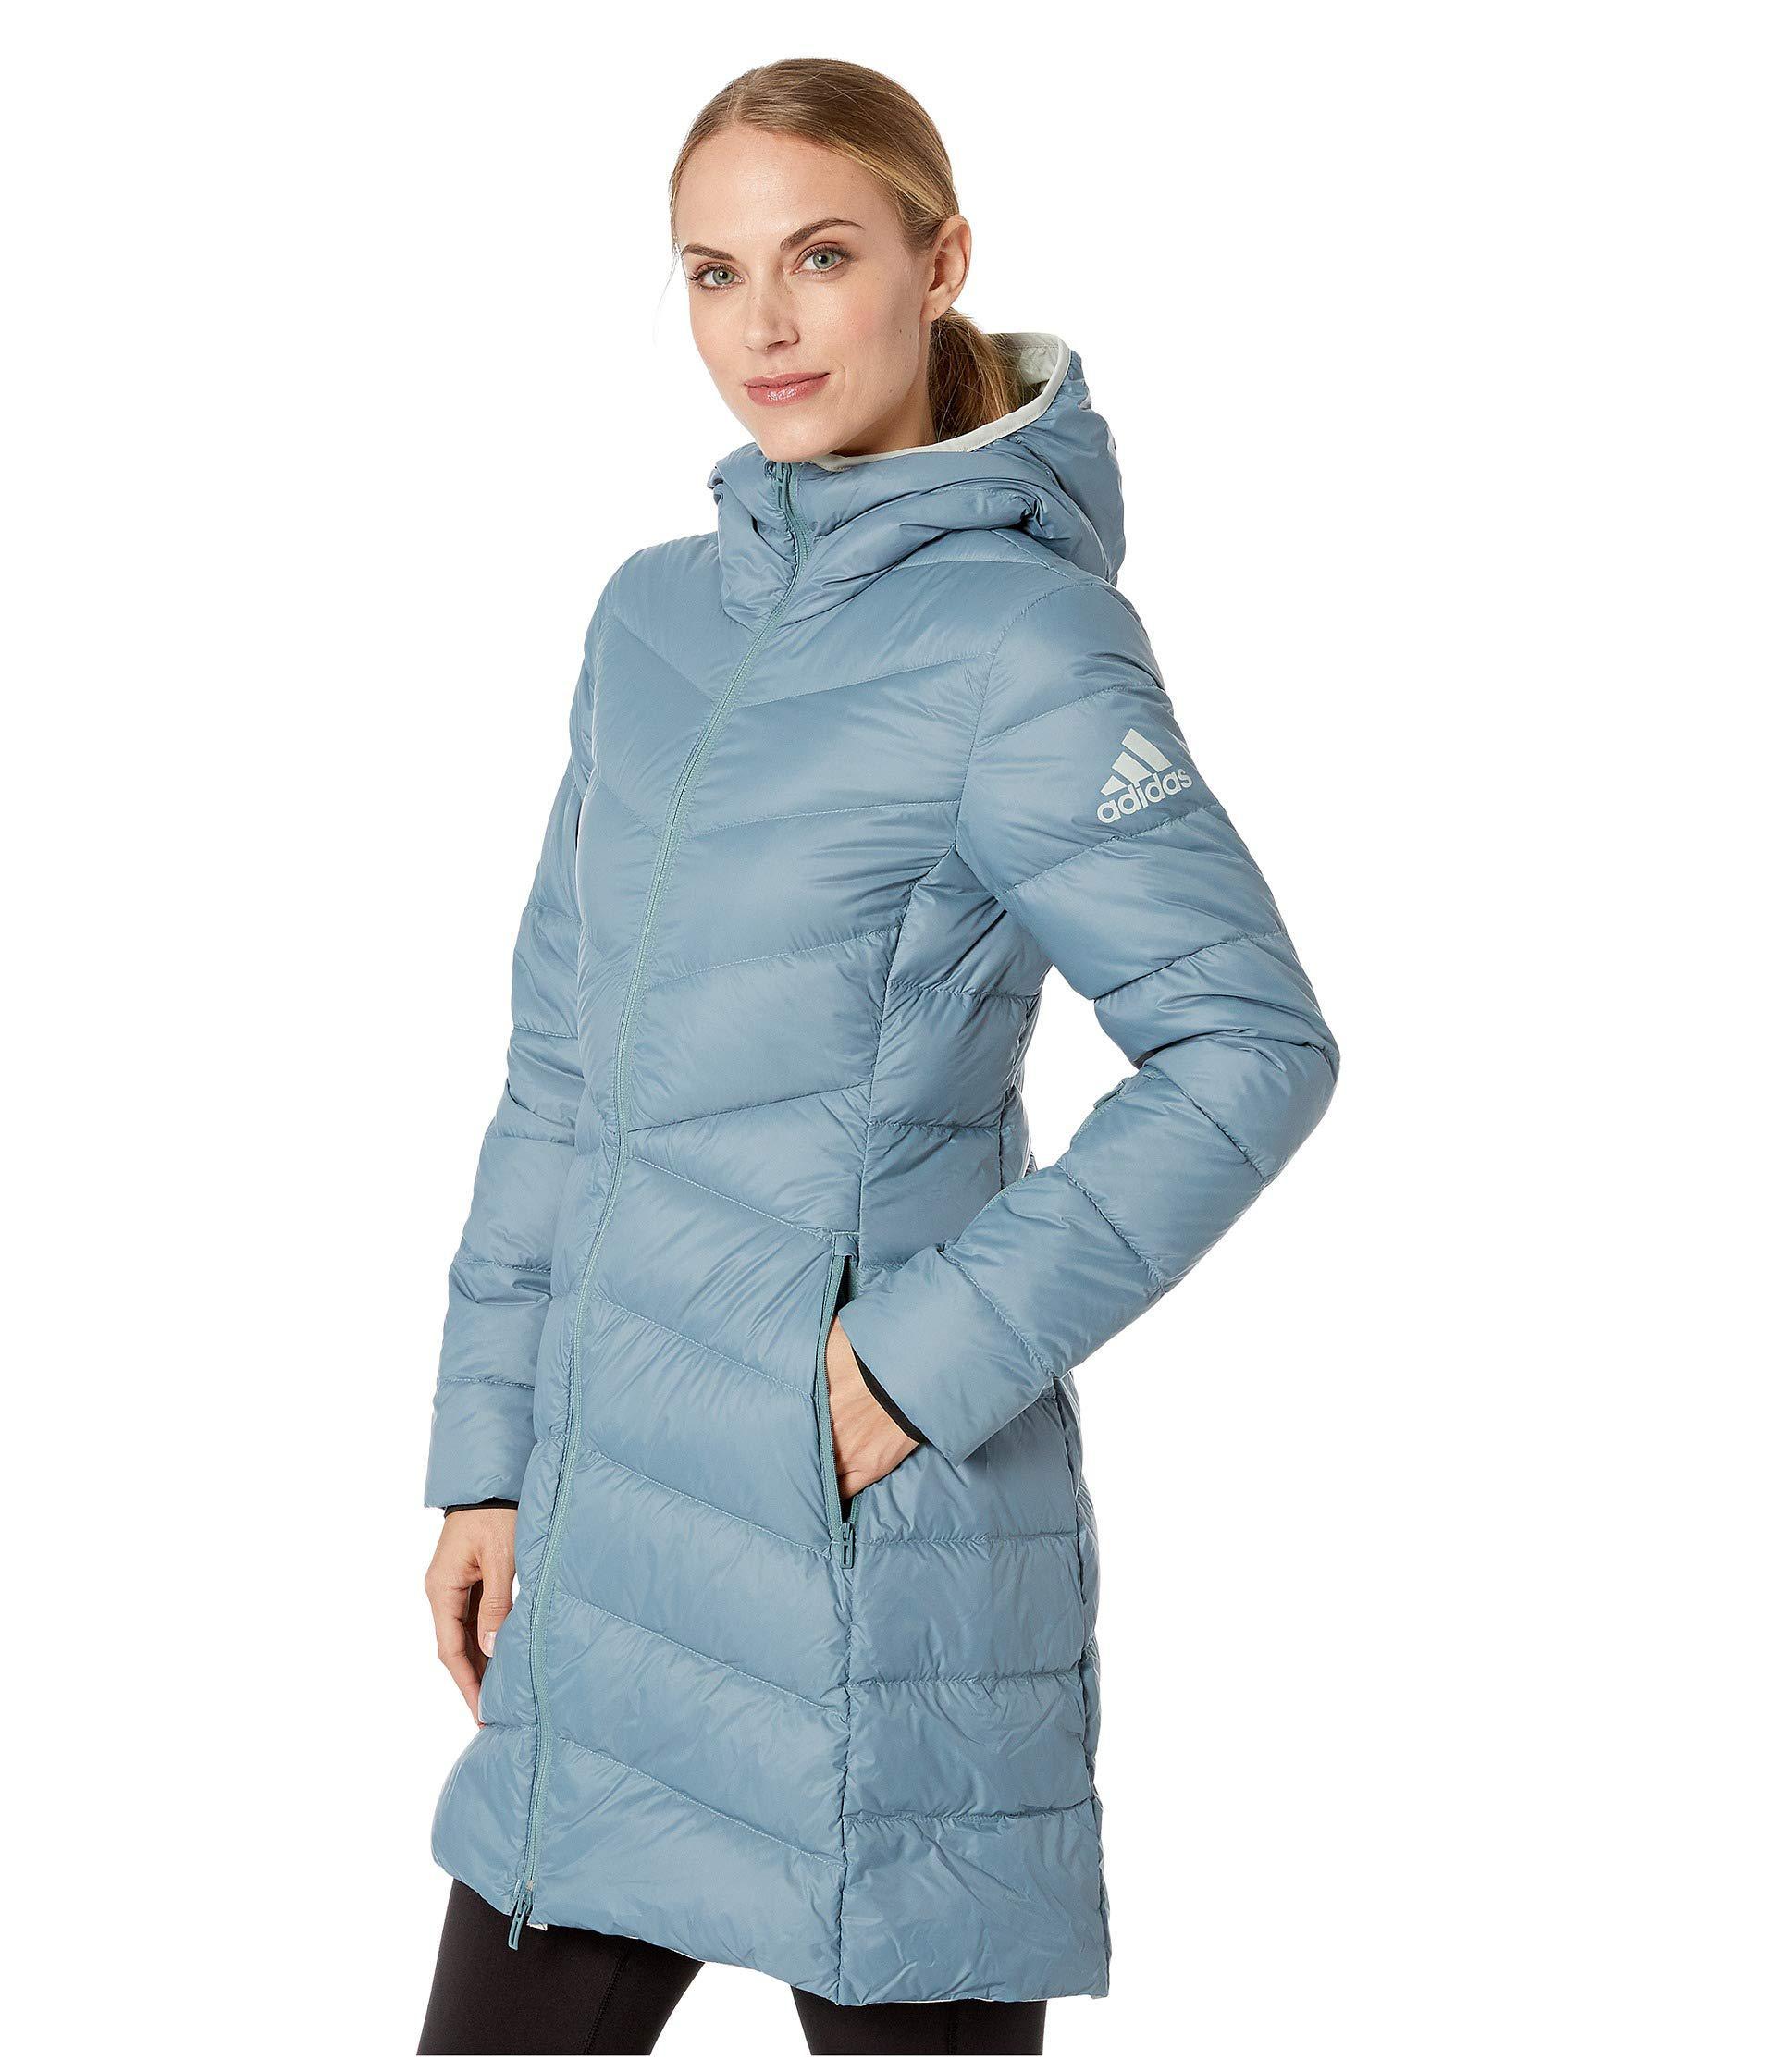 Lyst - Adidas Originals Climawarm(r) Hyperdry Nuvic Jacket (raw Green) Women s  Coat in Blue 24141b28fe